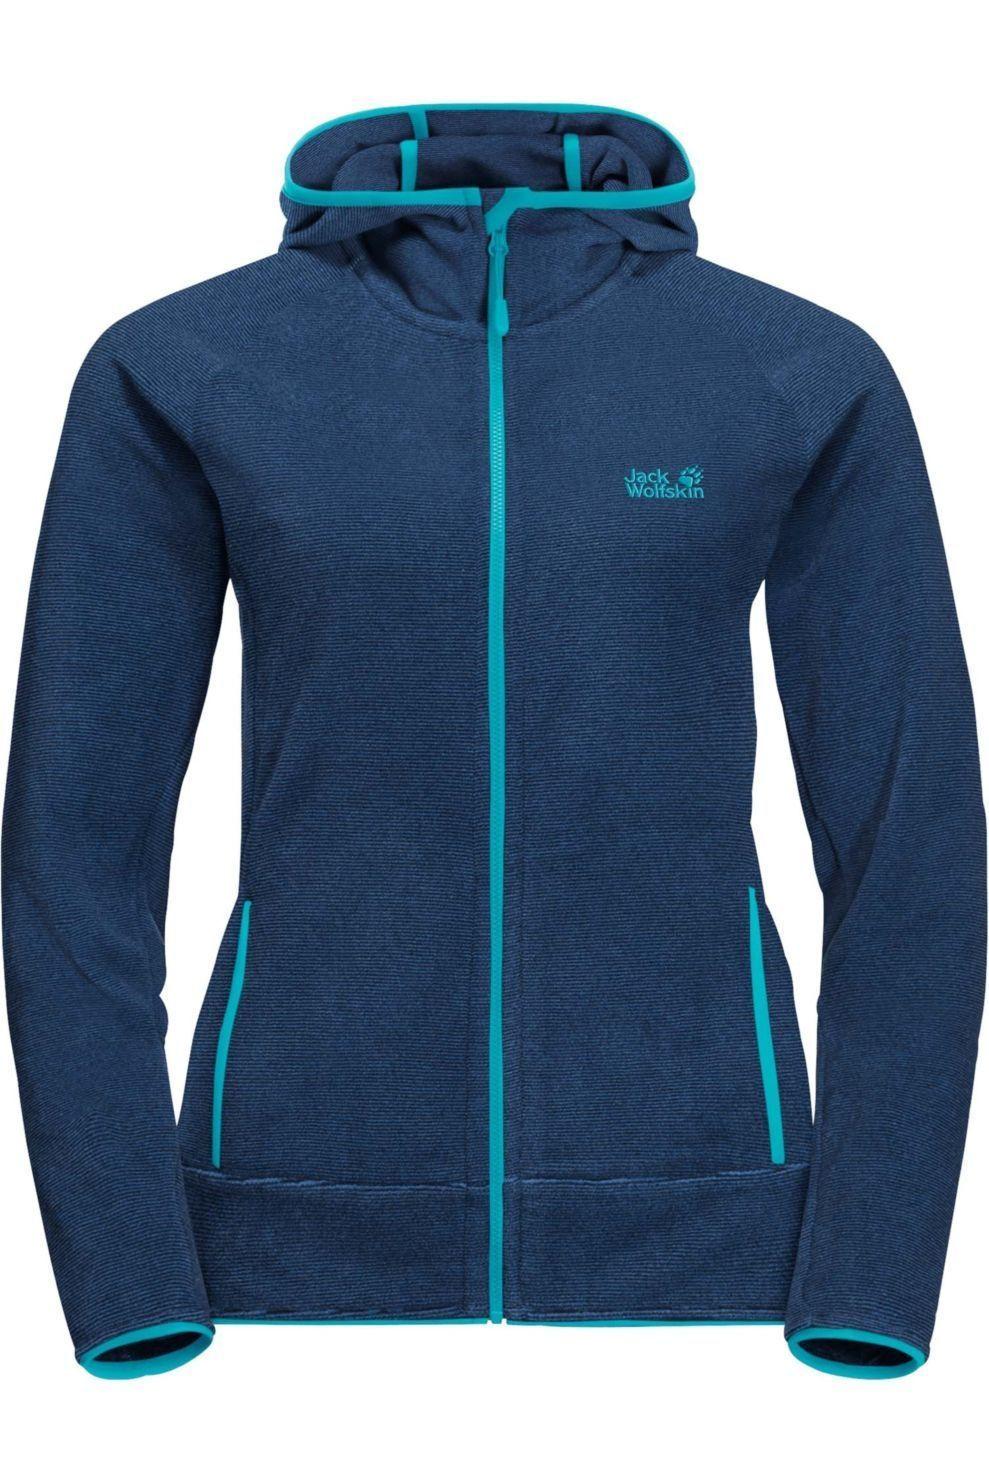 Jack Wolfskin Fleece Arco voor dames Blauw Maten: XS, S, M, L, XL, XXL